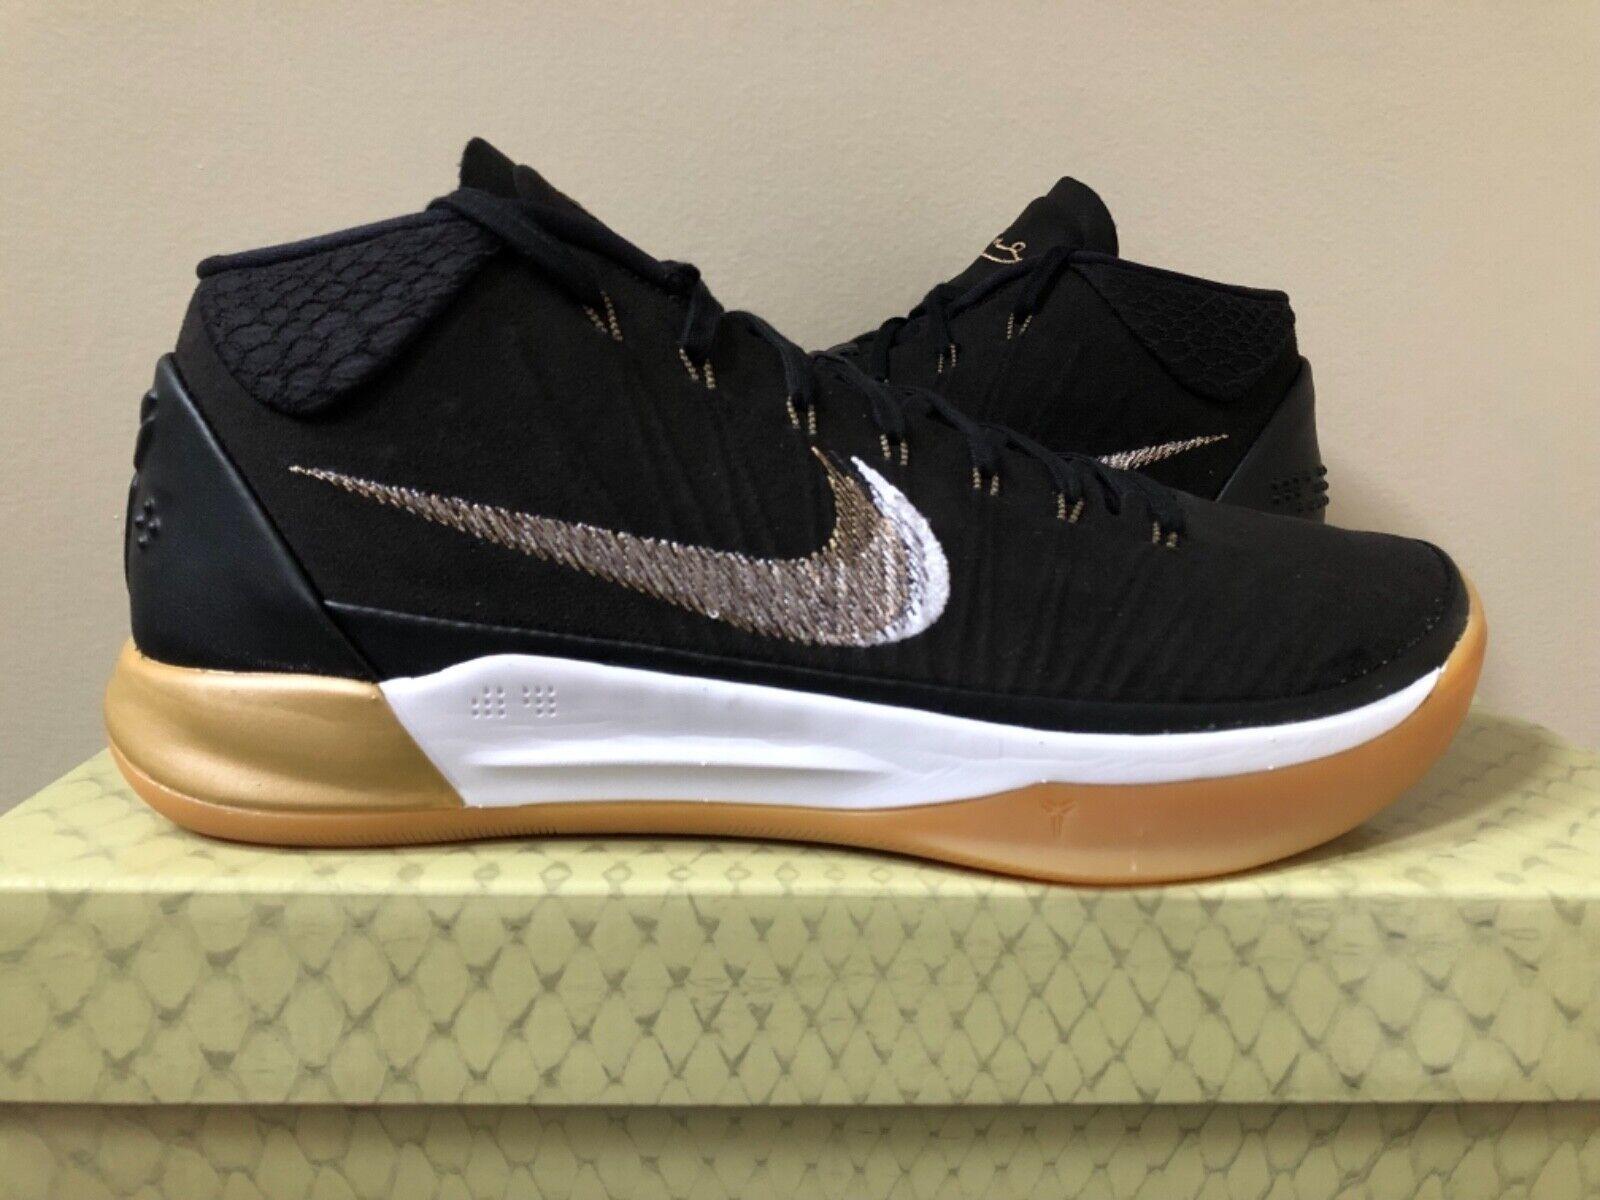 Nike Kobe AD Mid Black Gum 922482-009 922482-009 922482-009 Size 9-11 100% Authentic 3f158d